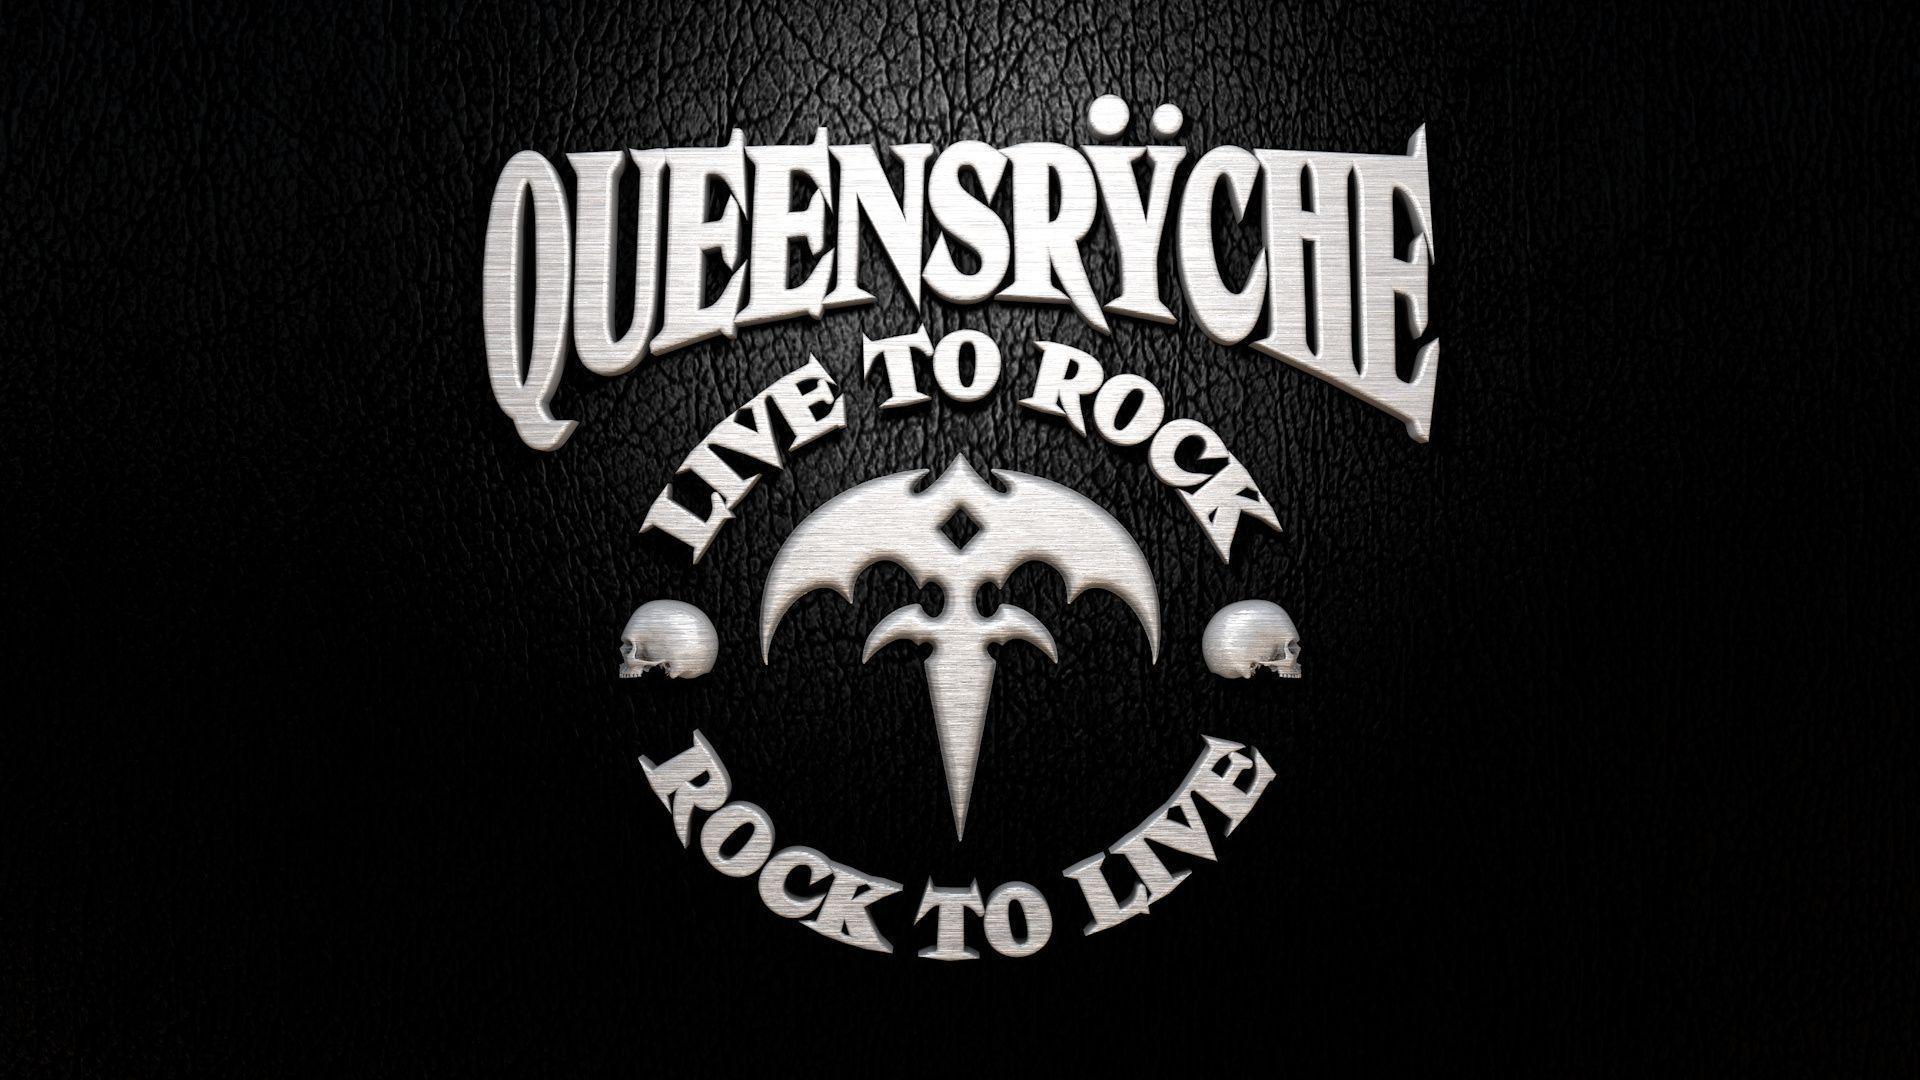 1920x1080 Music, Music Logo, Heavy Metal, Hard Rock, Queensryche ...